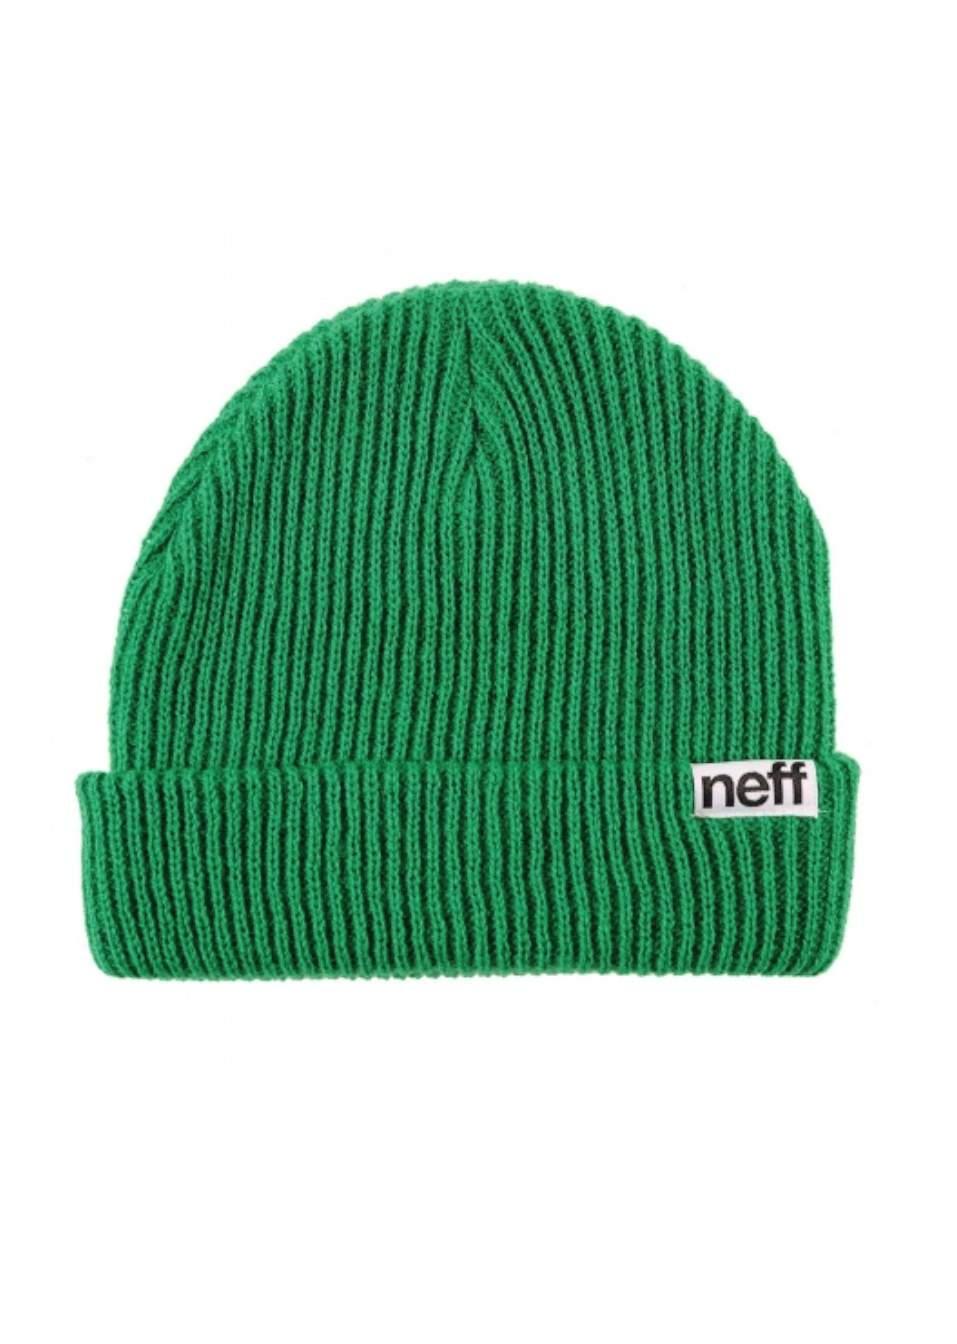 NEFF FOLD GREEN - LM BOARD STORE